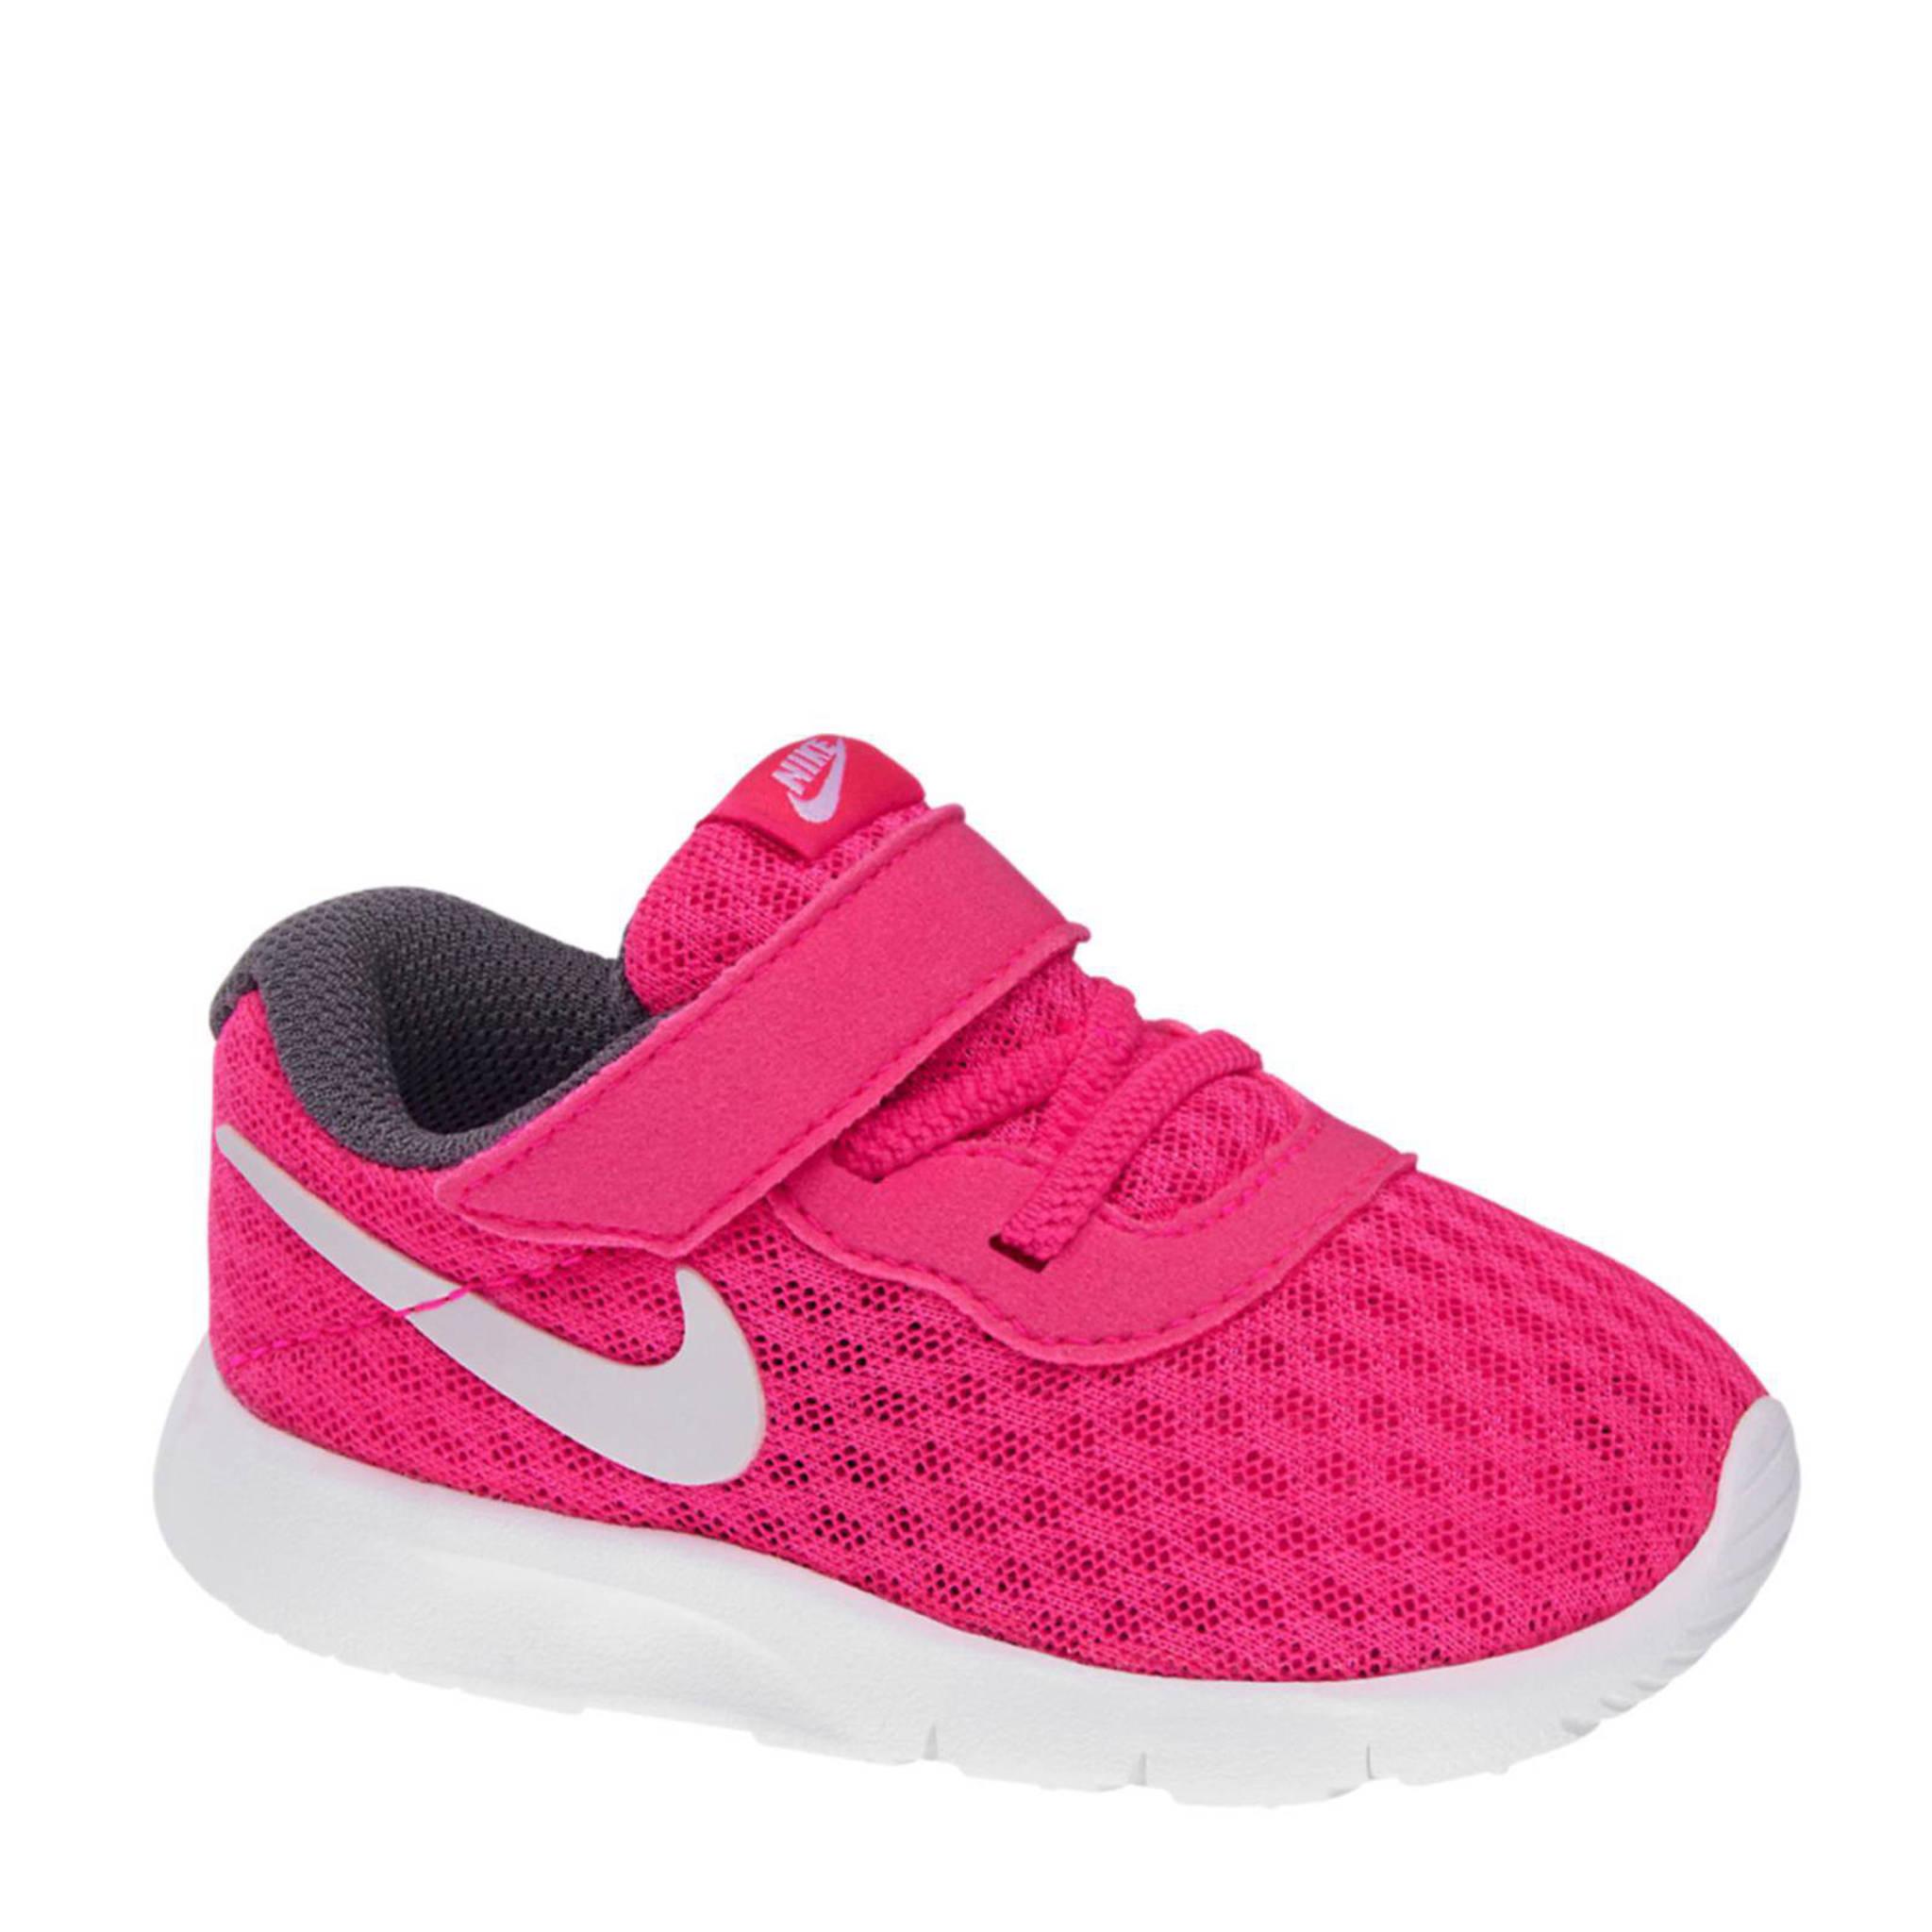 a6eadcdc235 Nike Tanjun sneakers meisjes | wehkamp